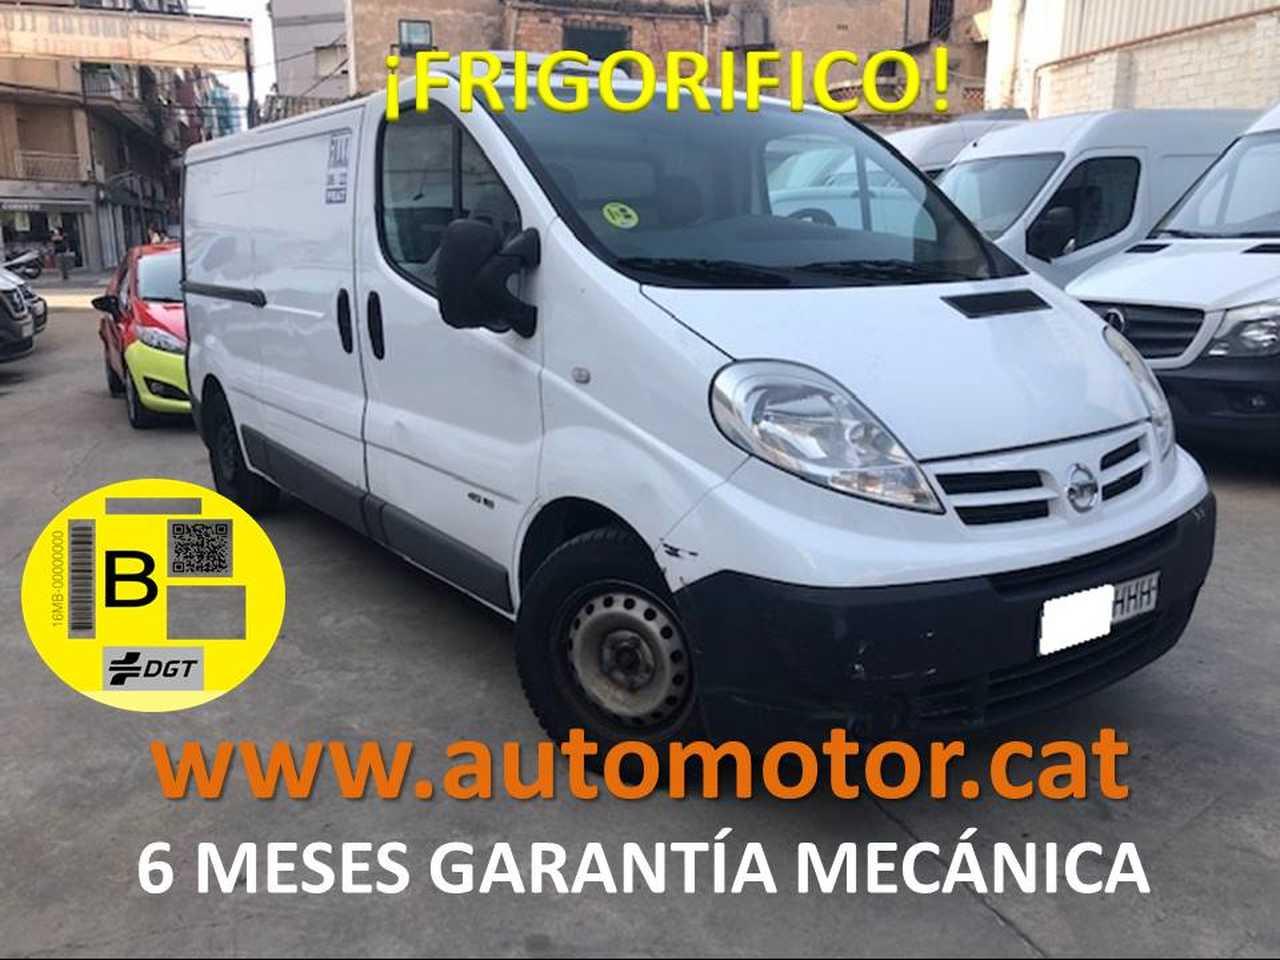 Nissan Primastar Fg. L2H1 2.0dCi 115 - GARANTIA MECANICA  - Foto 1